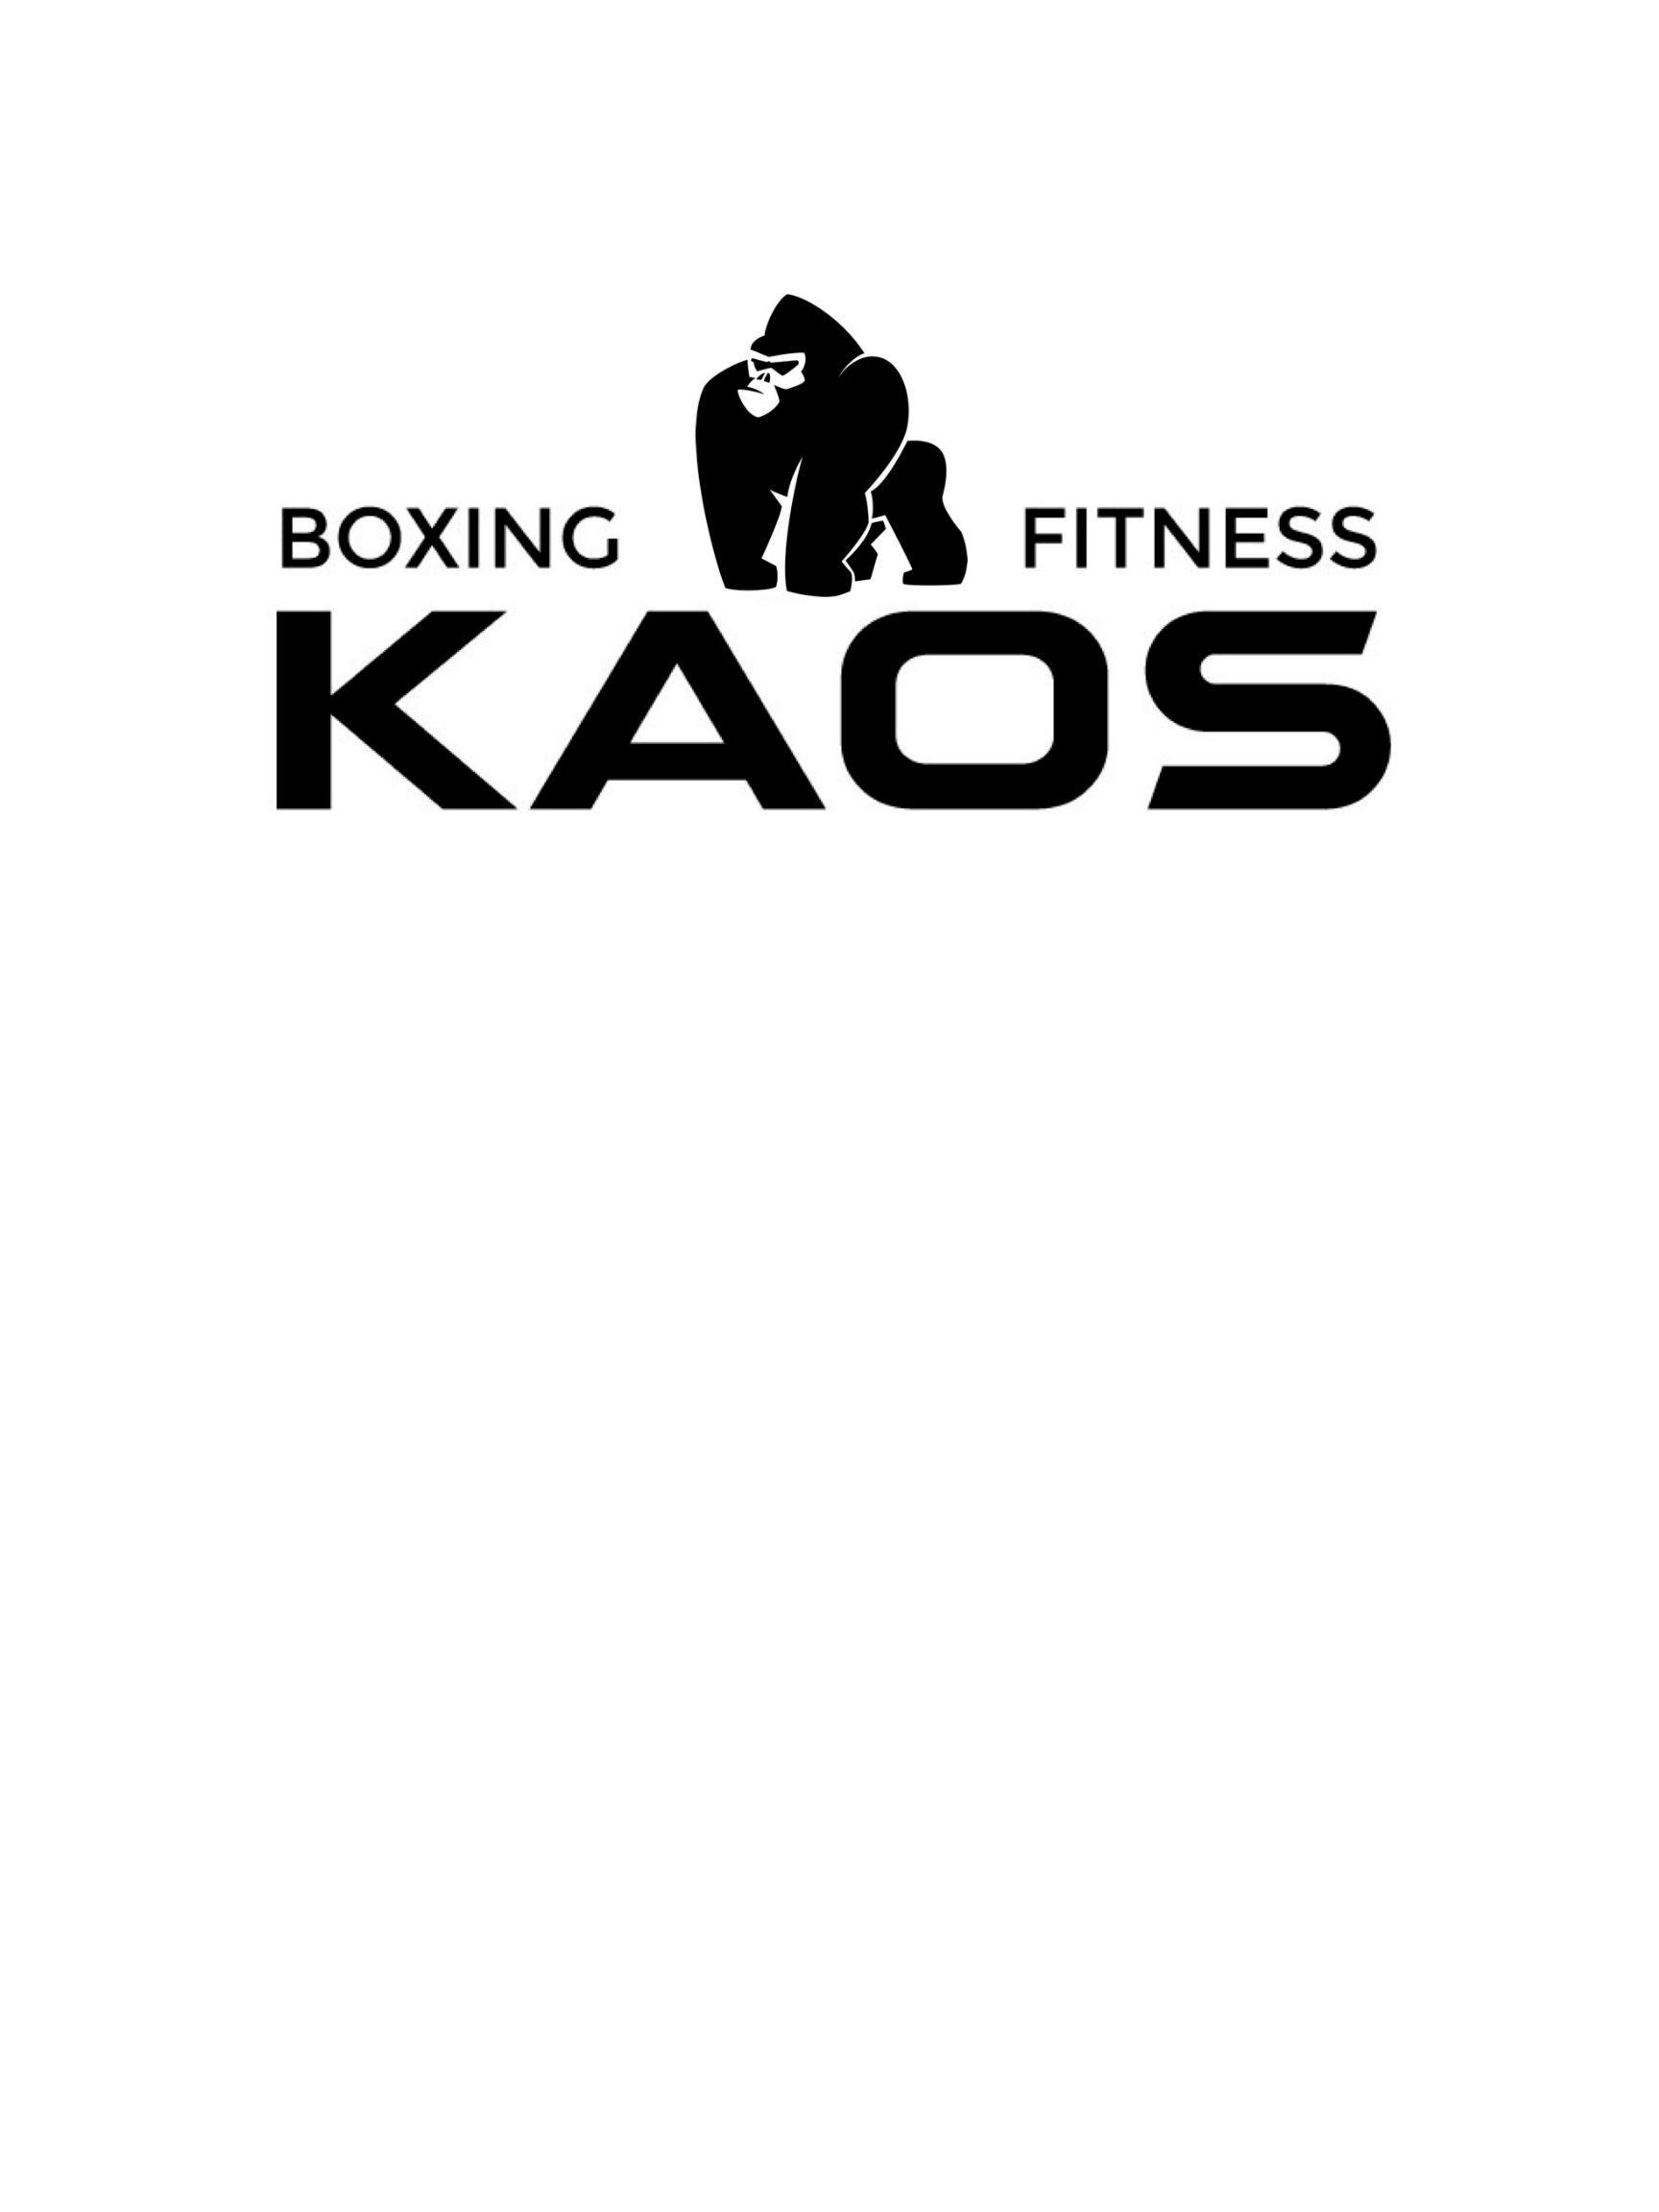 Kaos Boxing and Fitness